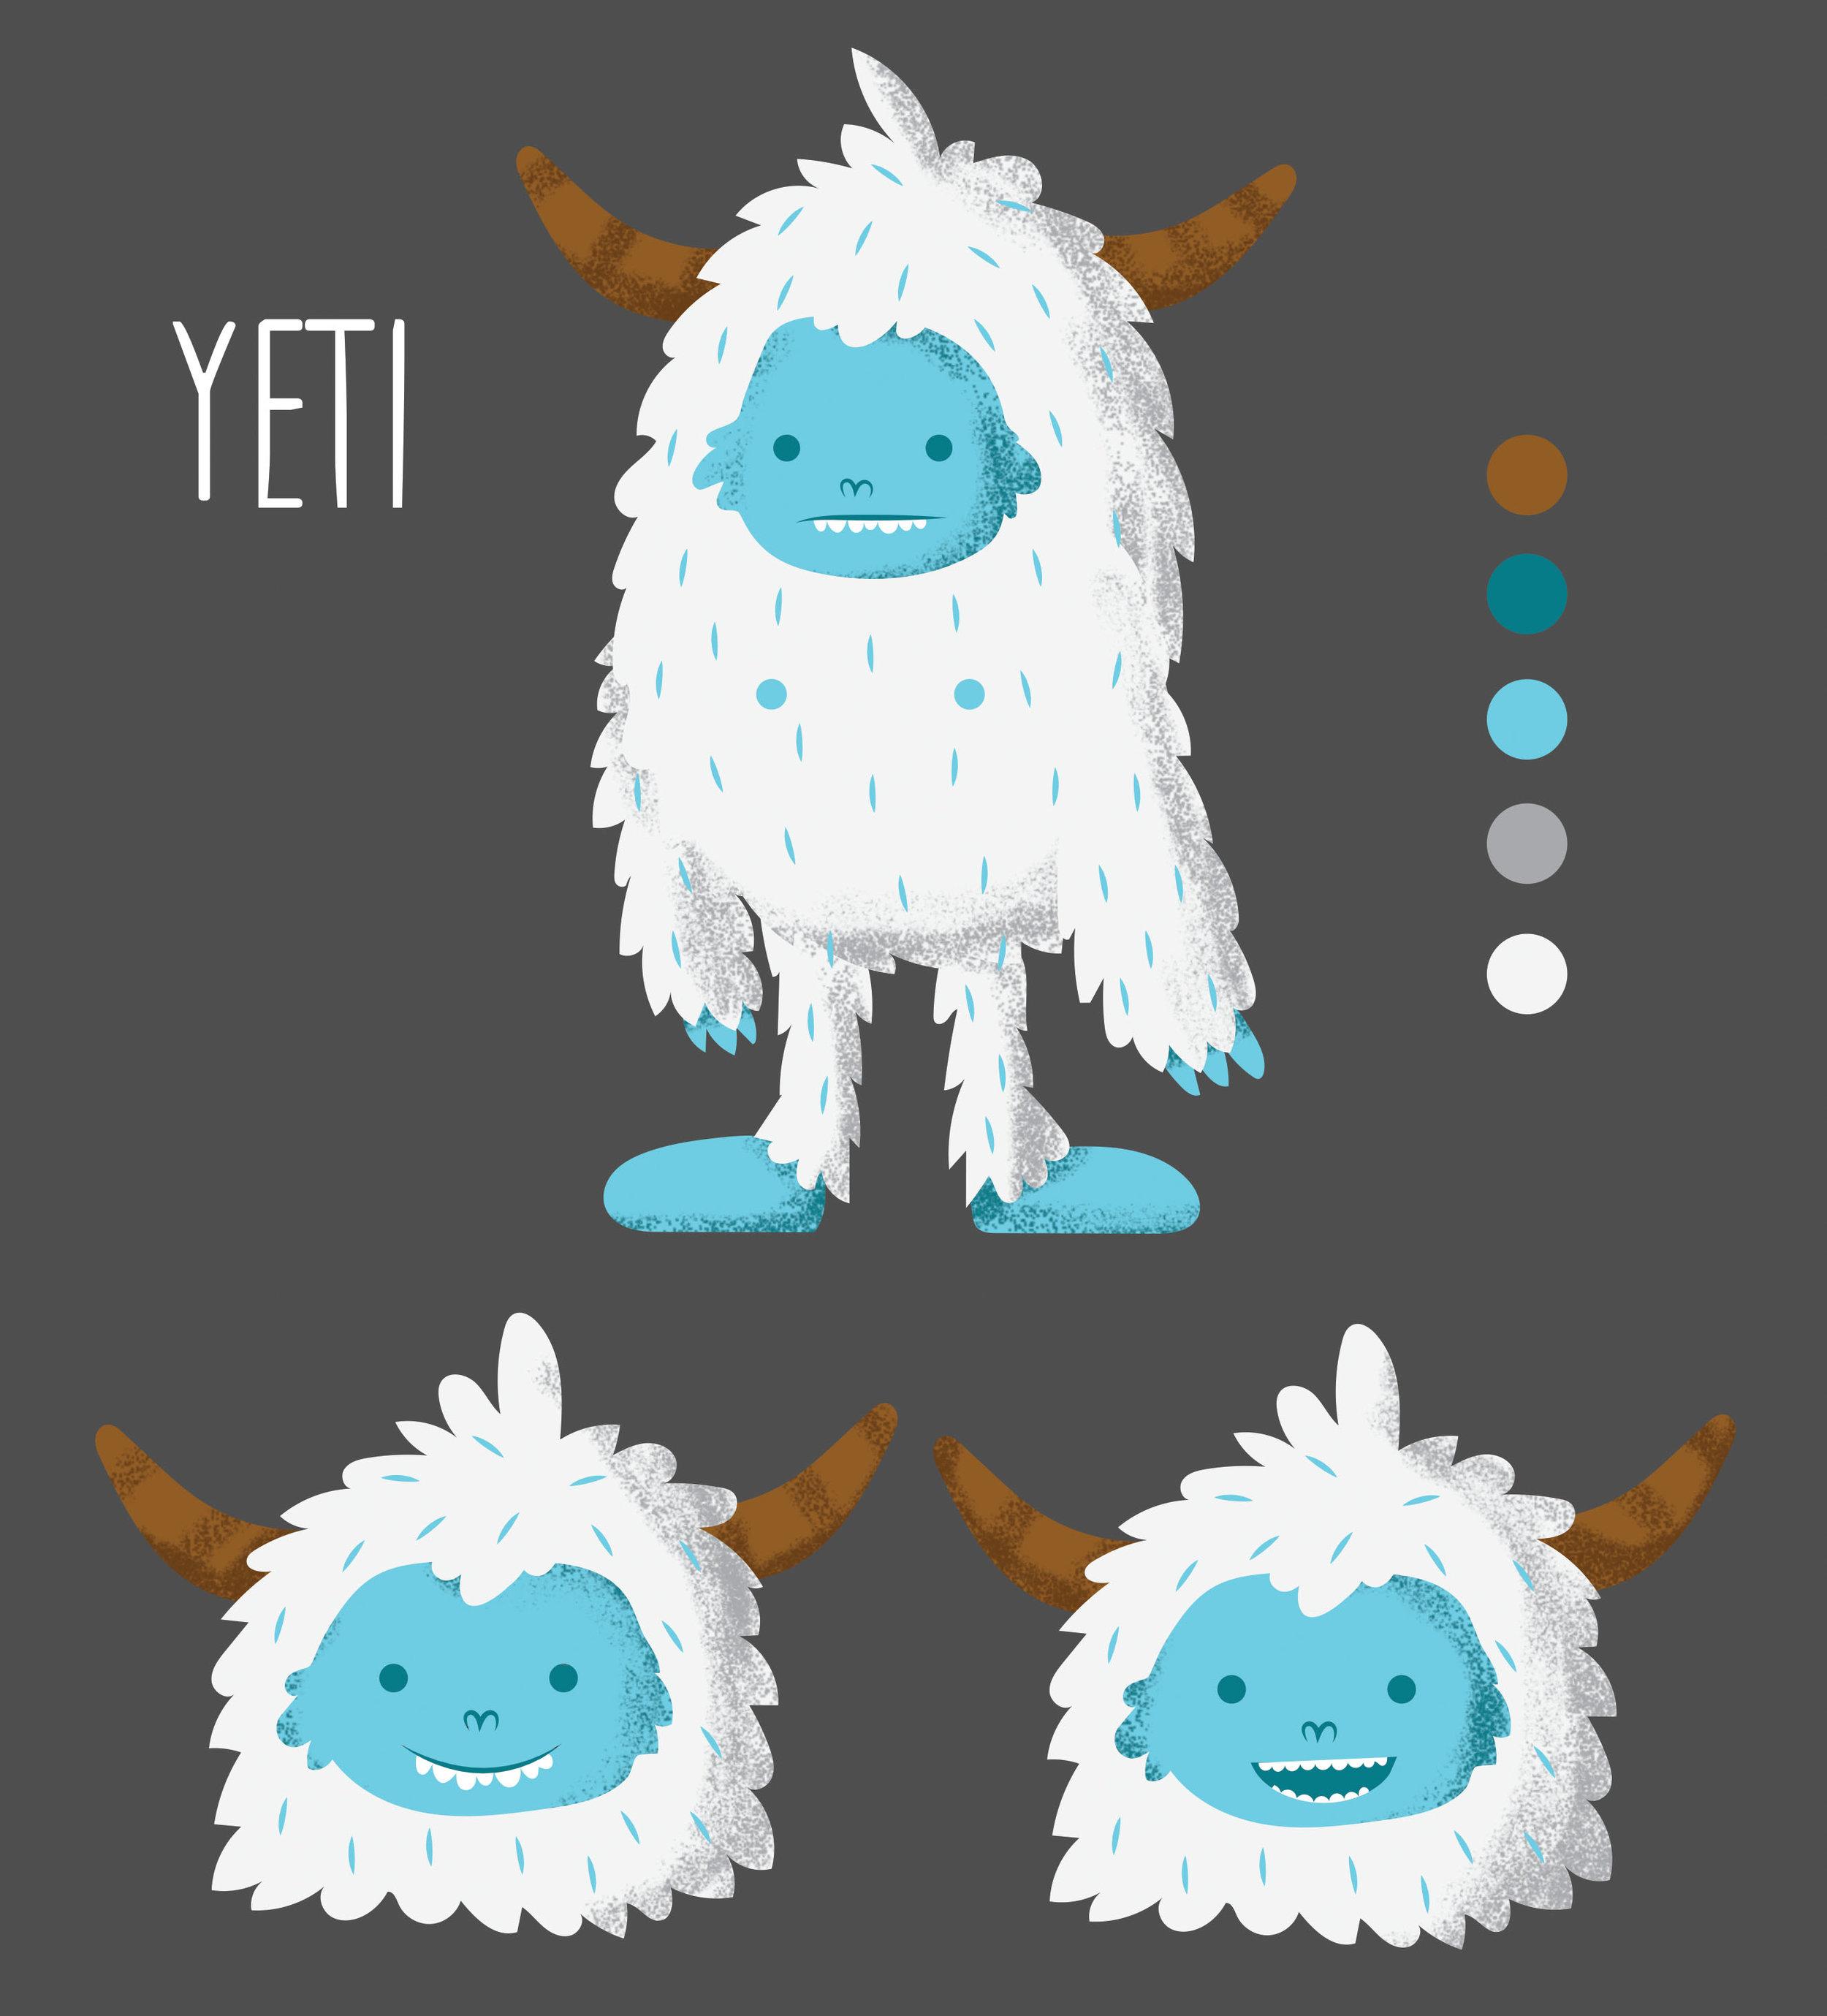 Yeti design.jpg